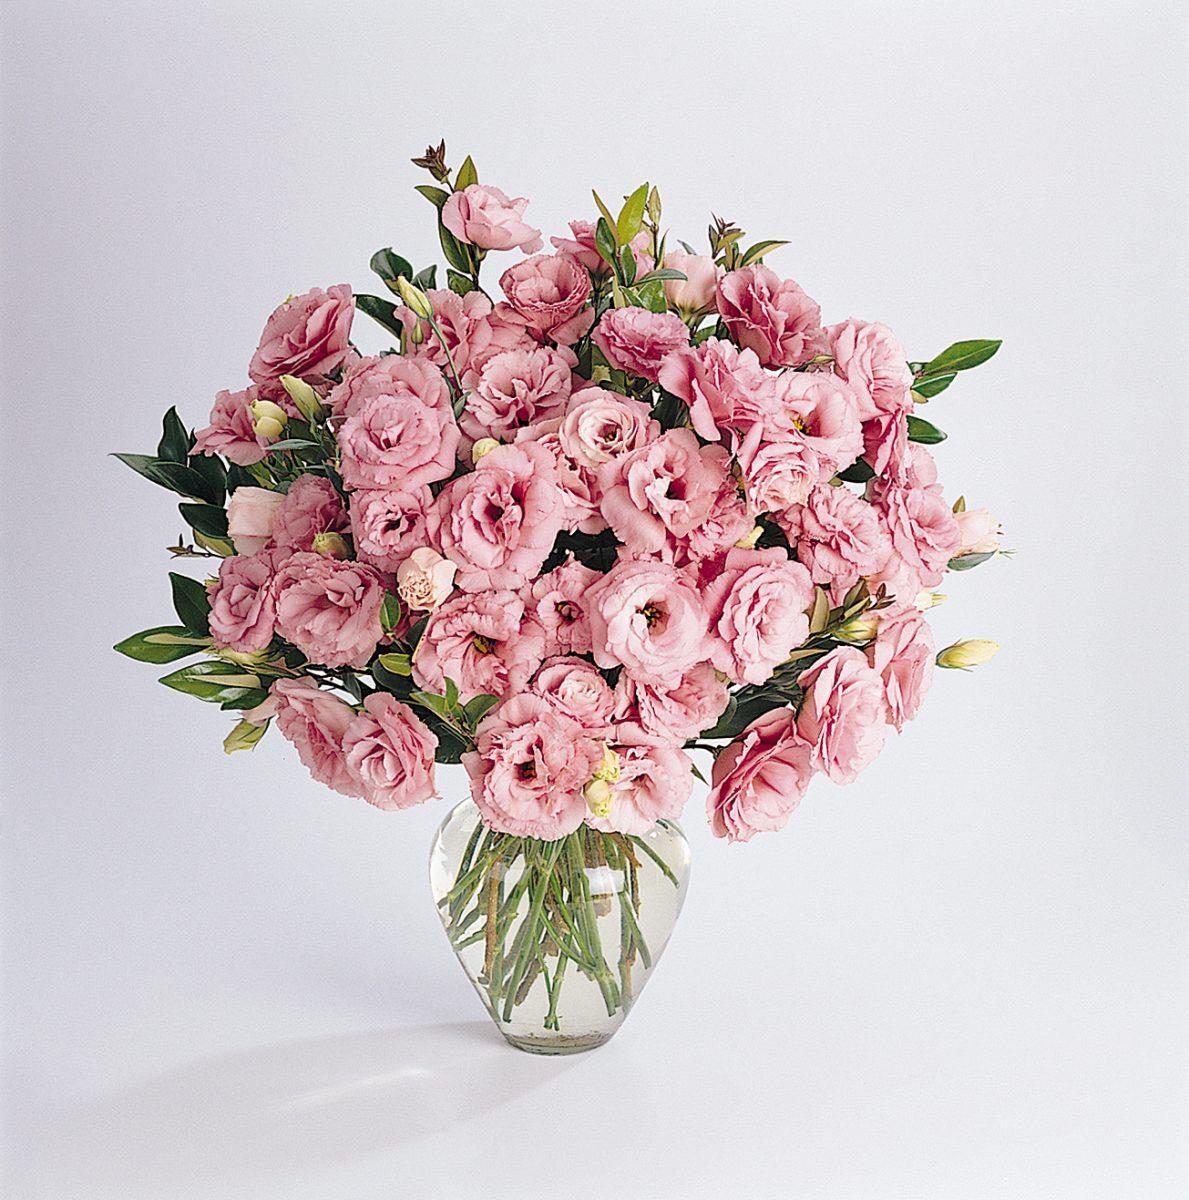 ABC 1 Deep Rose Lisianthus (Non-Organic)